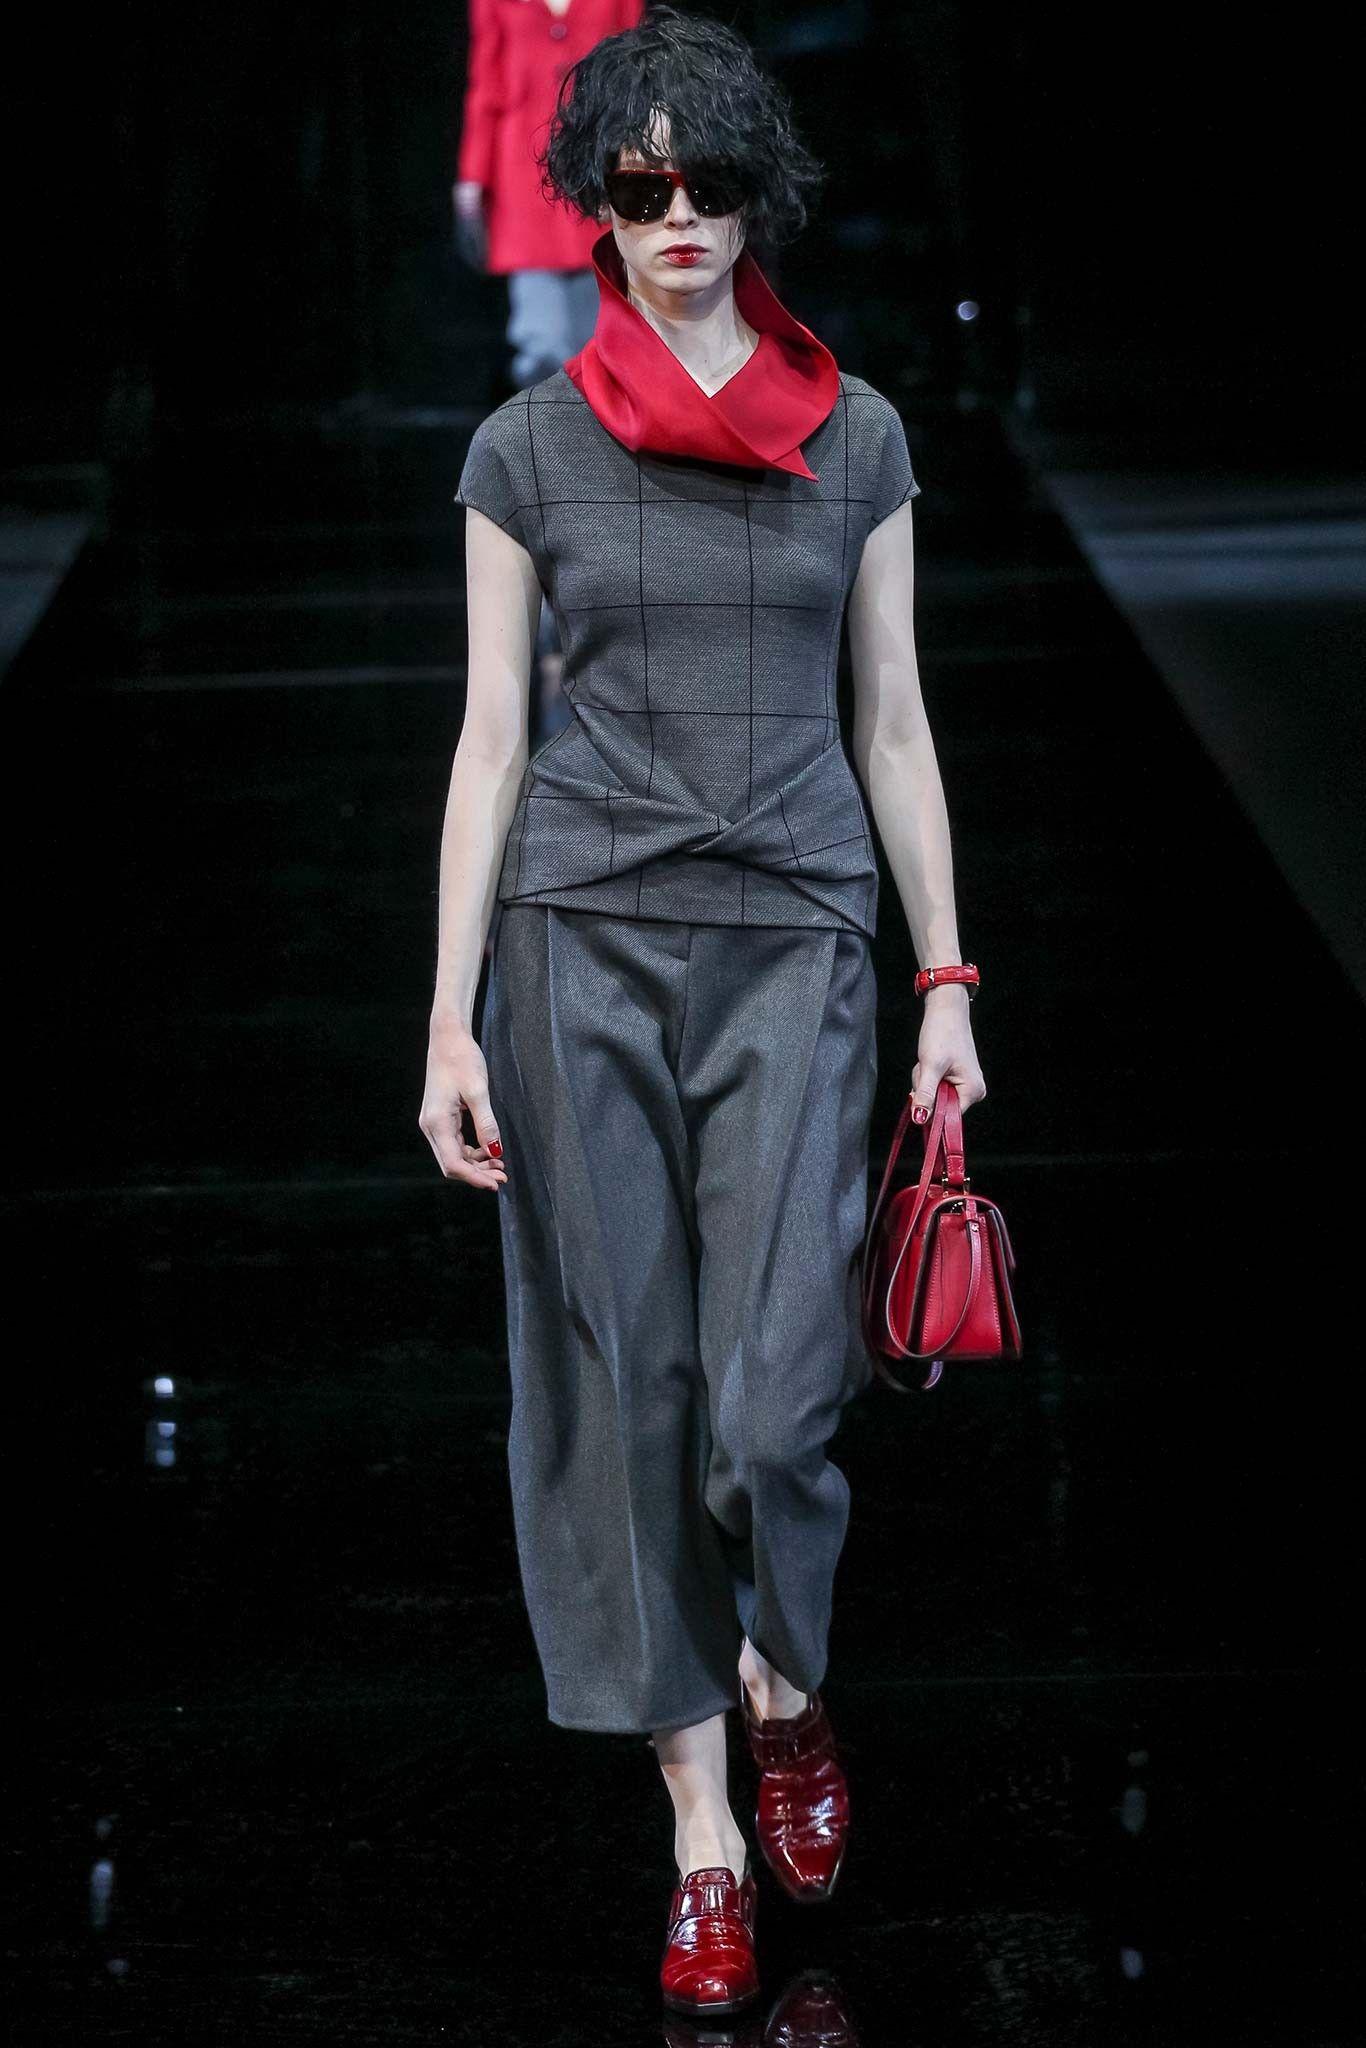 Emporio Armani fall/winter 2015 collection Milan fashion